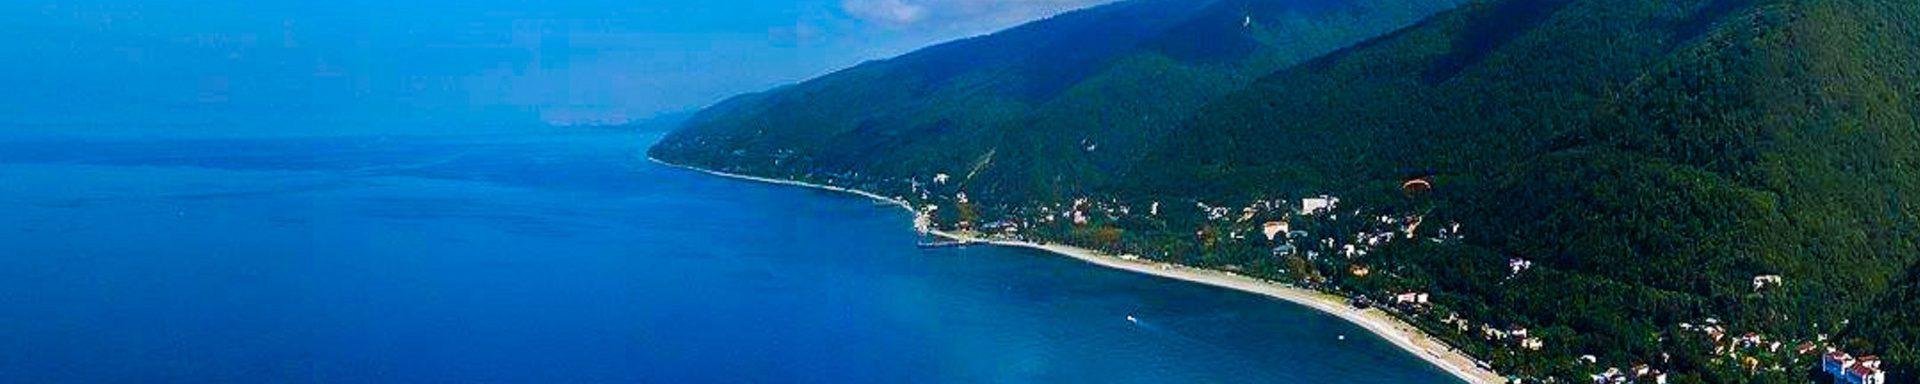 Слйд - Абхазия